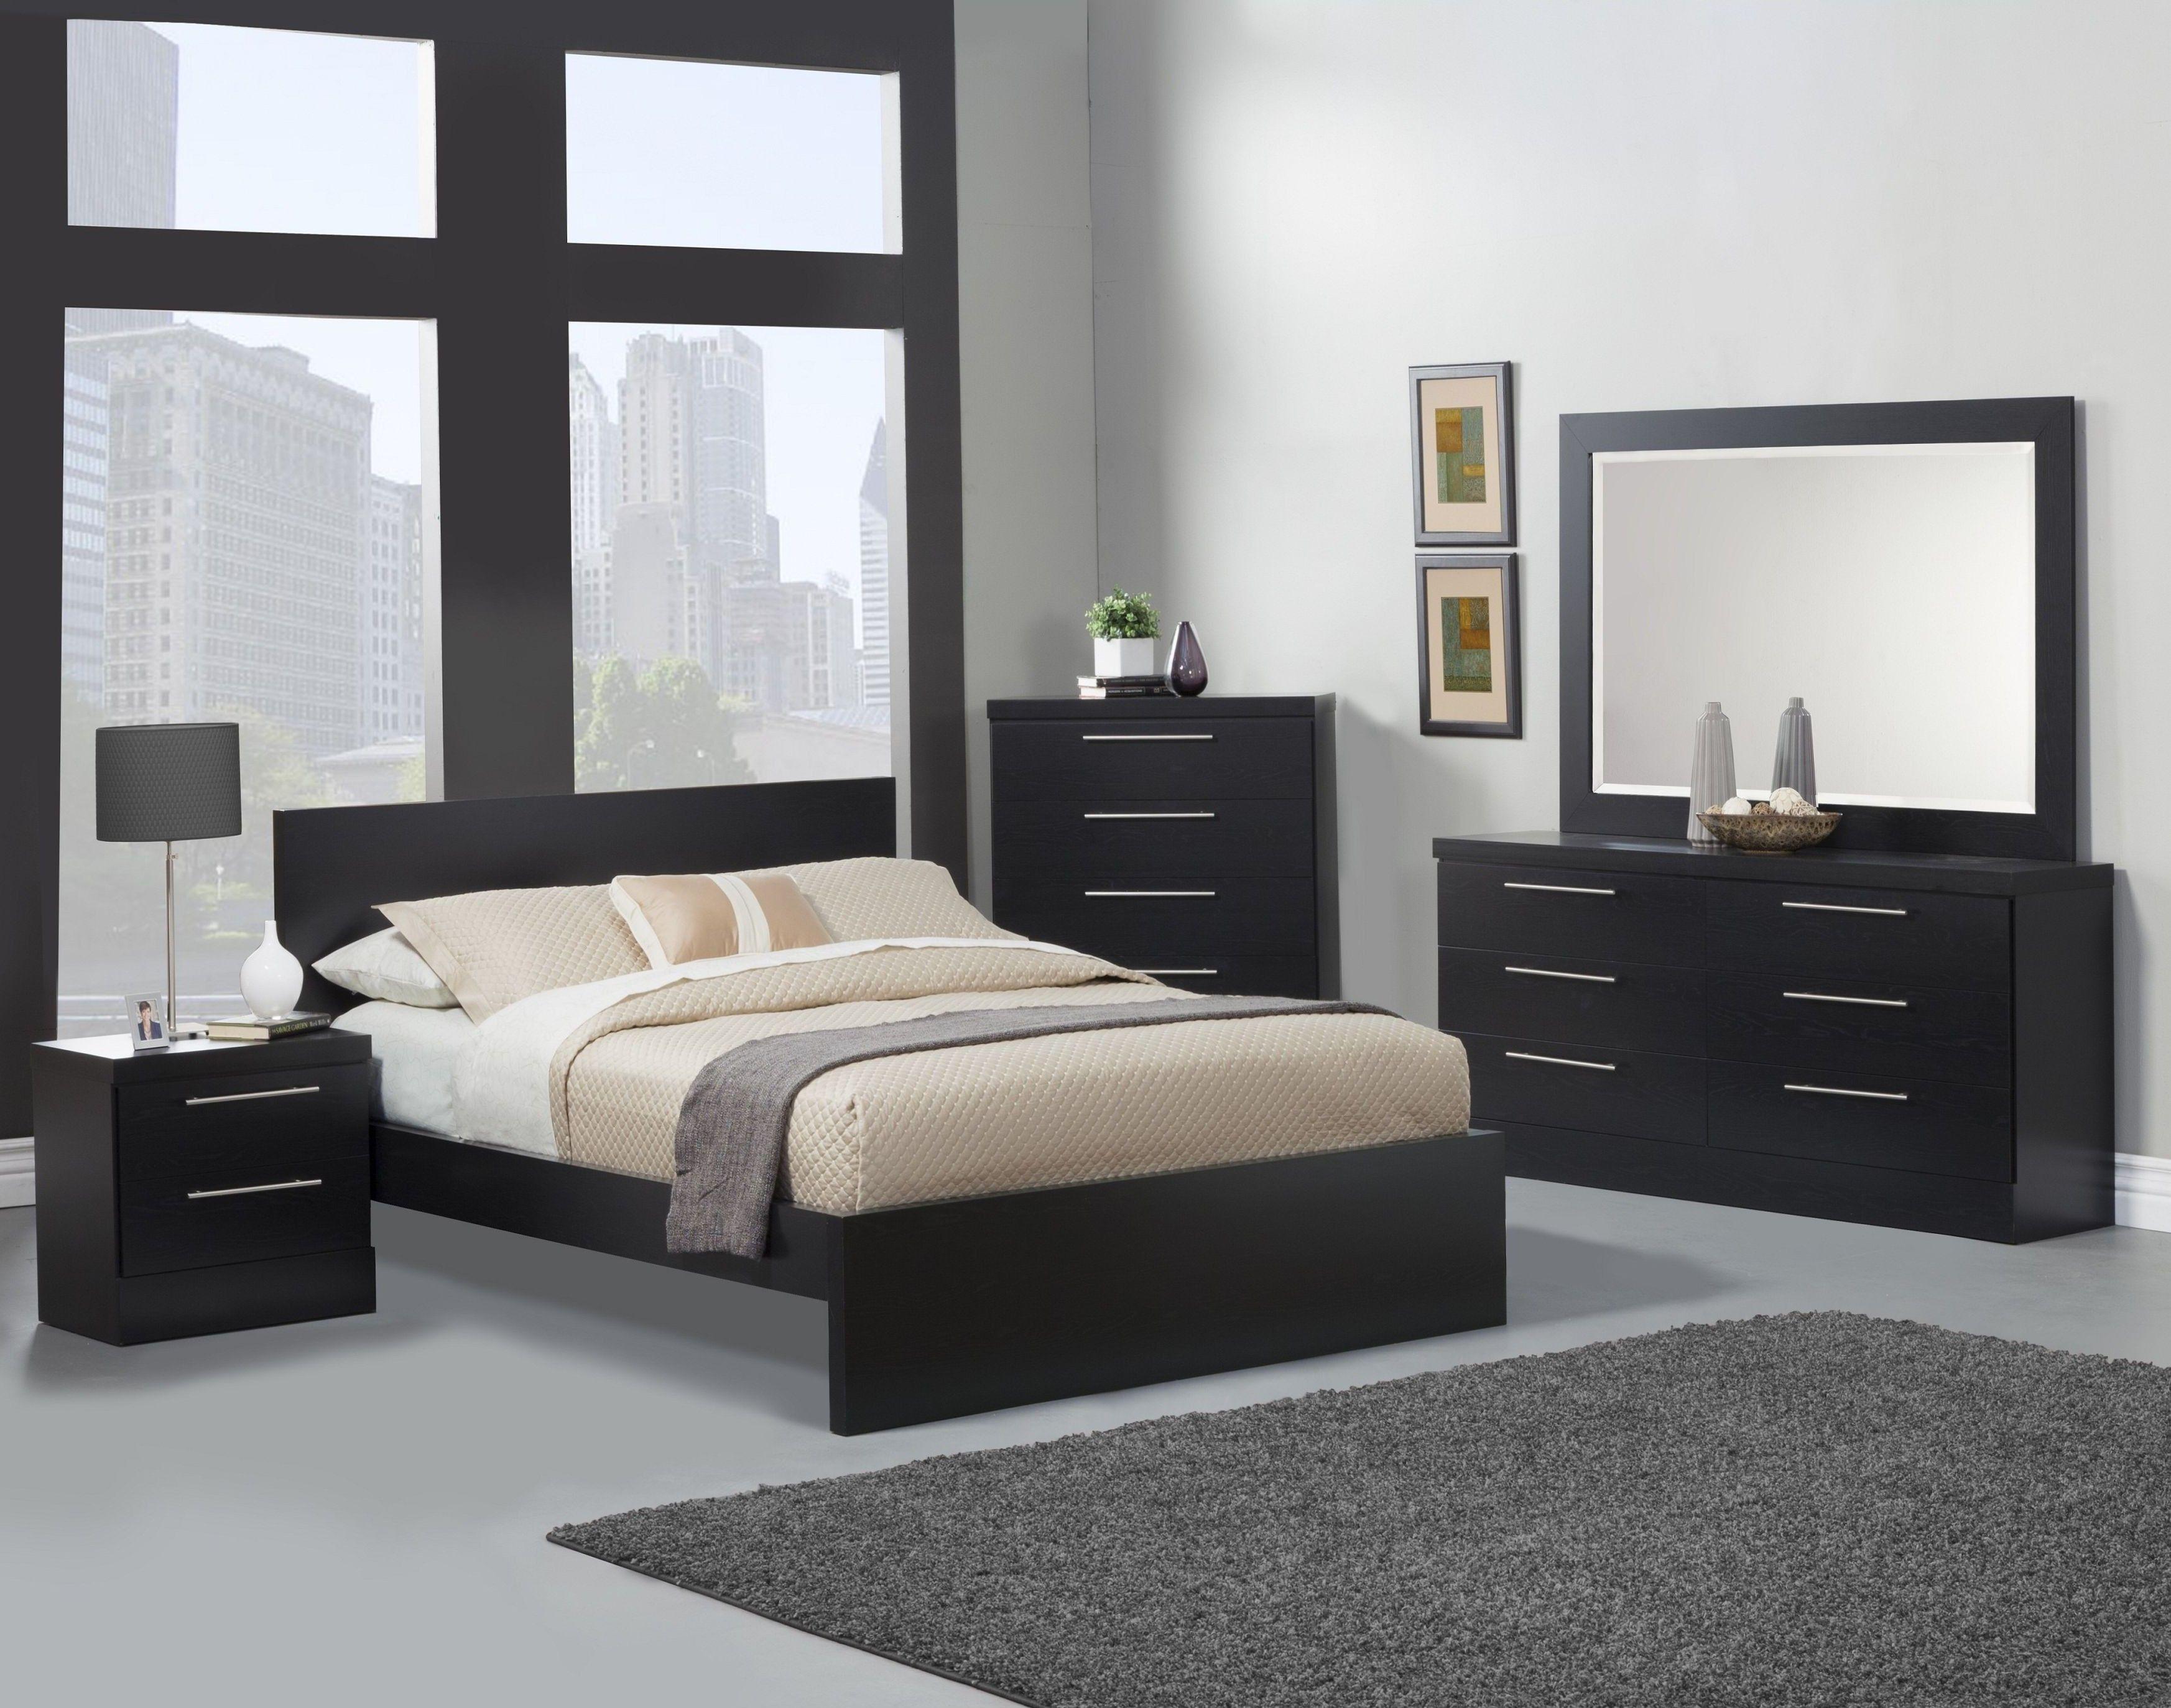 Best Elegant Bedroom Furniture With Minimalist Interior Design 640 x 480